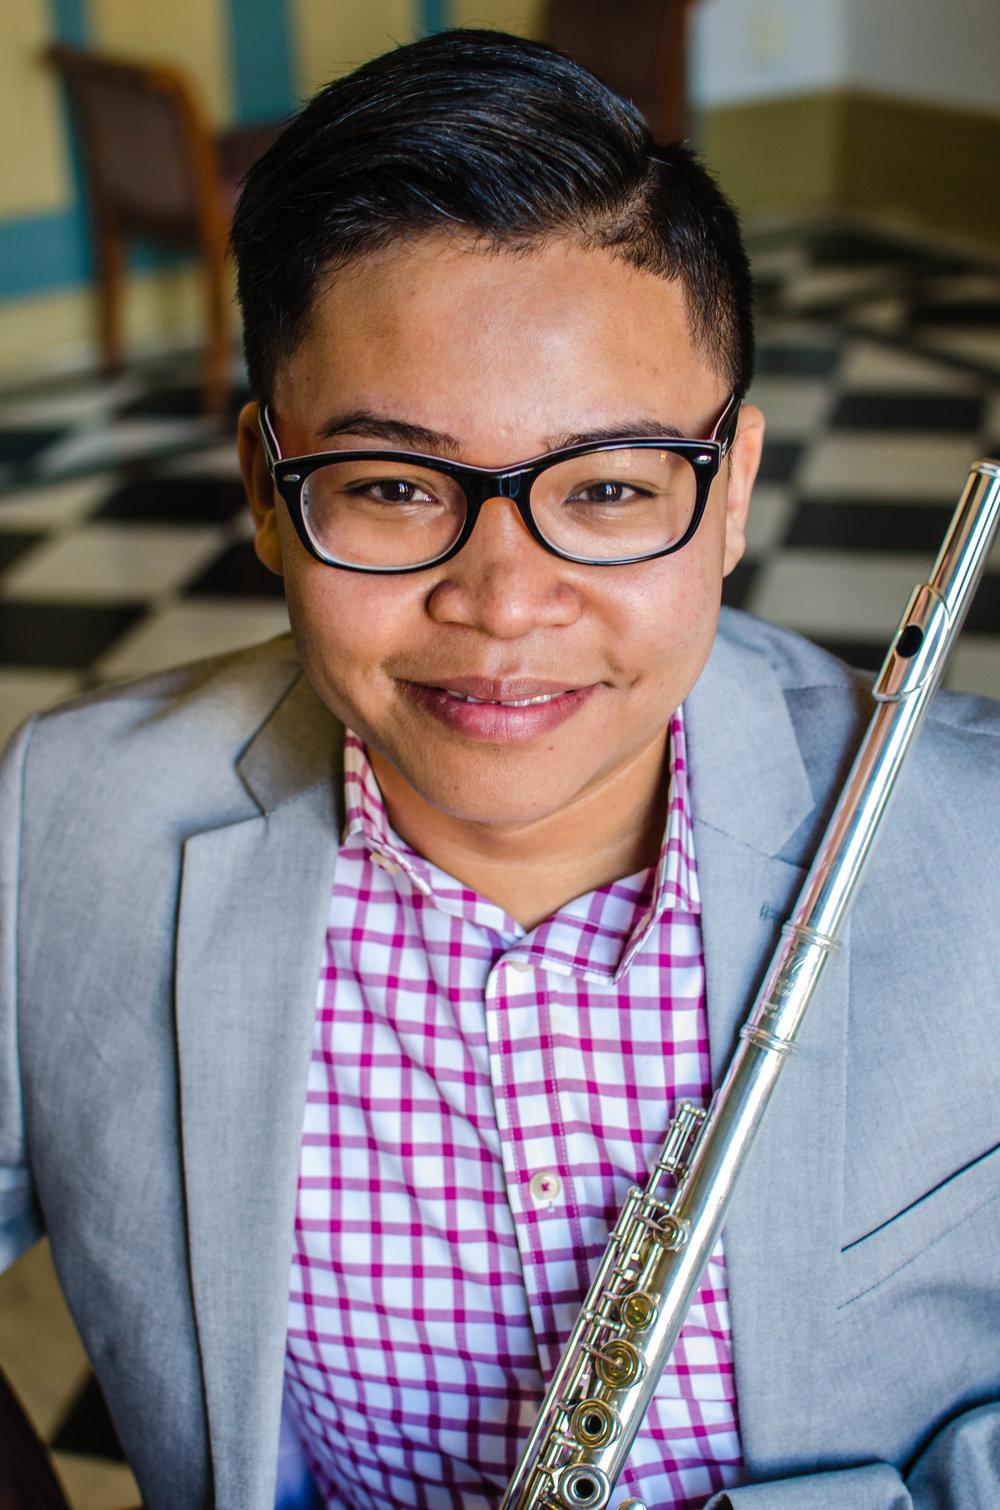 David Le, flute